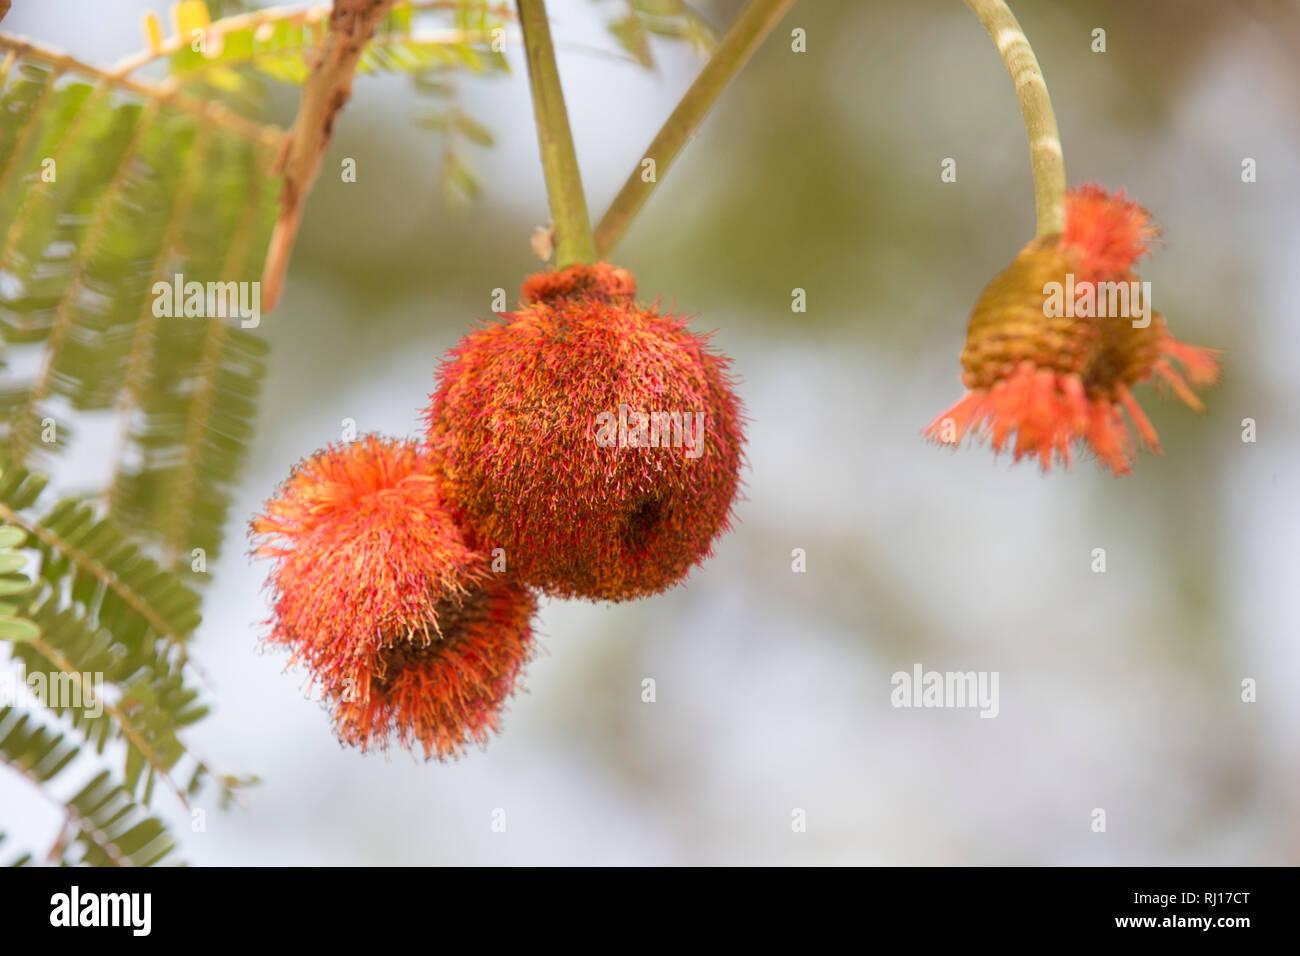 La-toden village, Yako Province, Burkina Faso. Fruit of the Dawadawa tree. - Stock Image